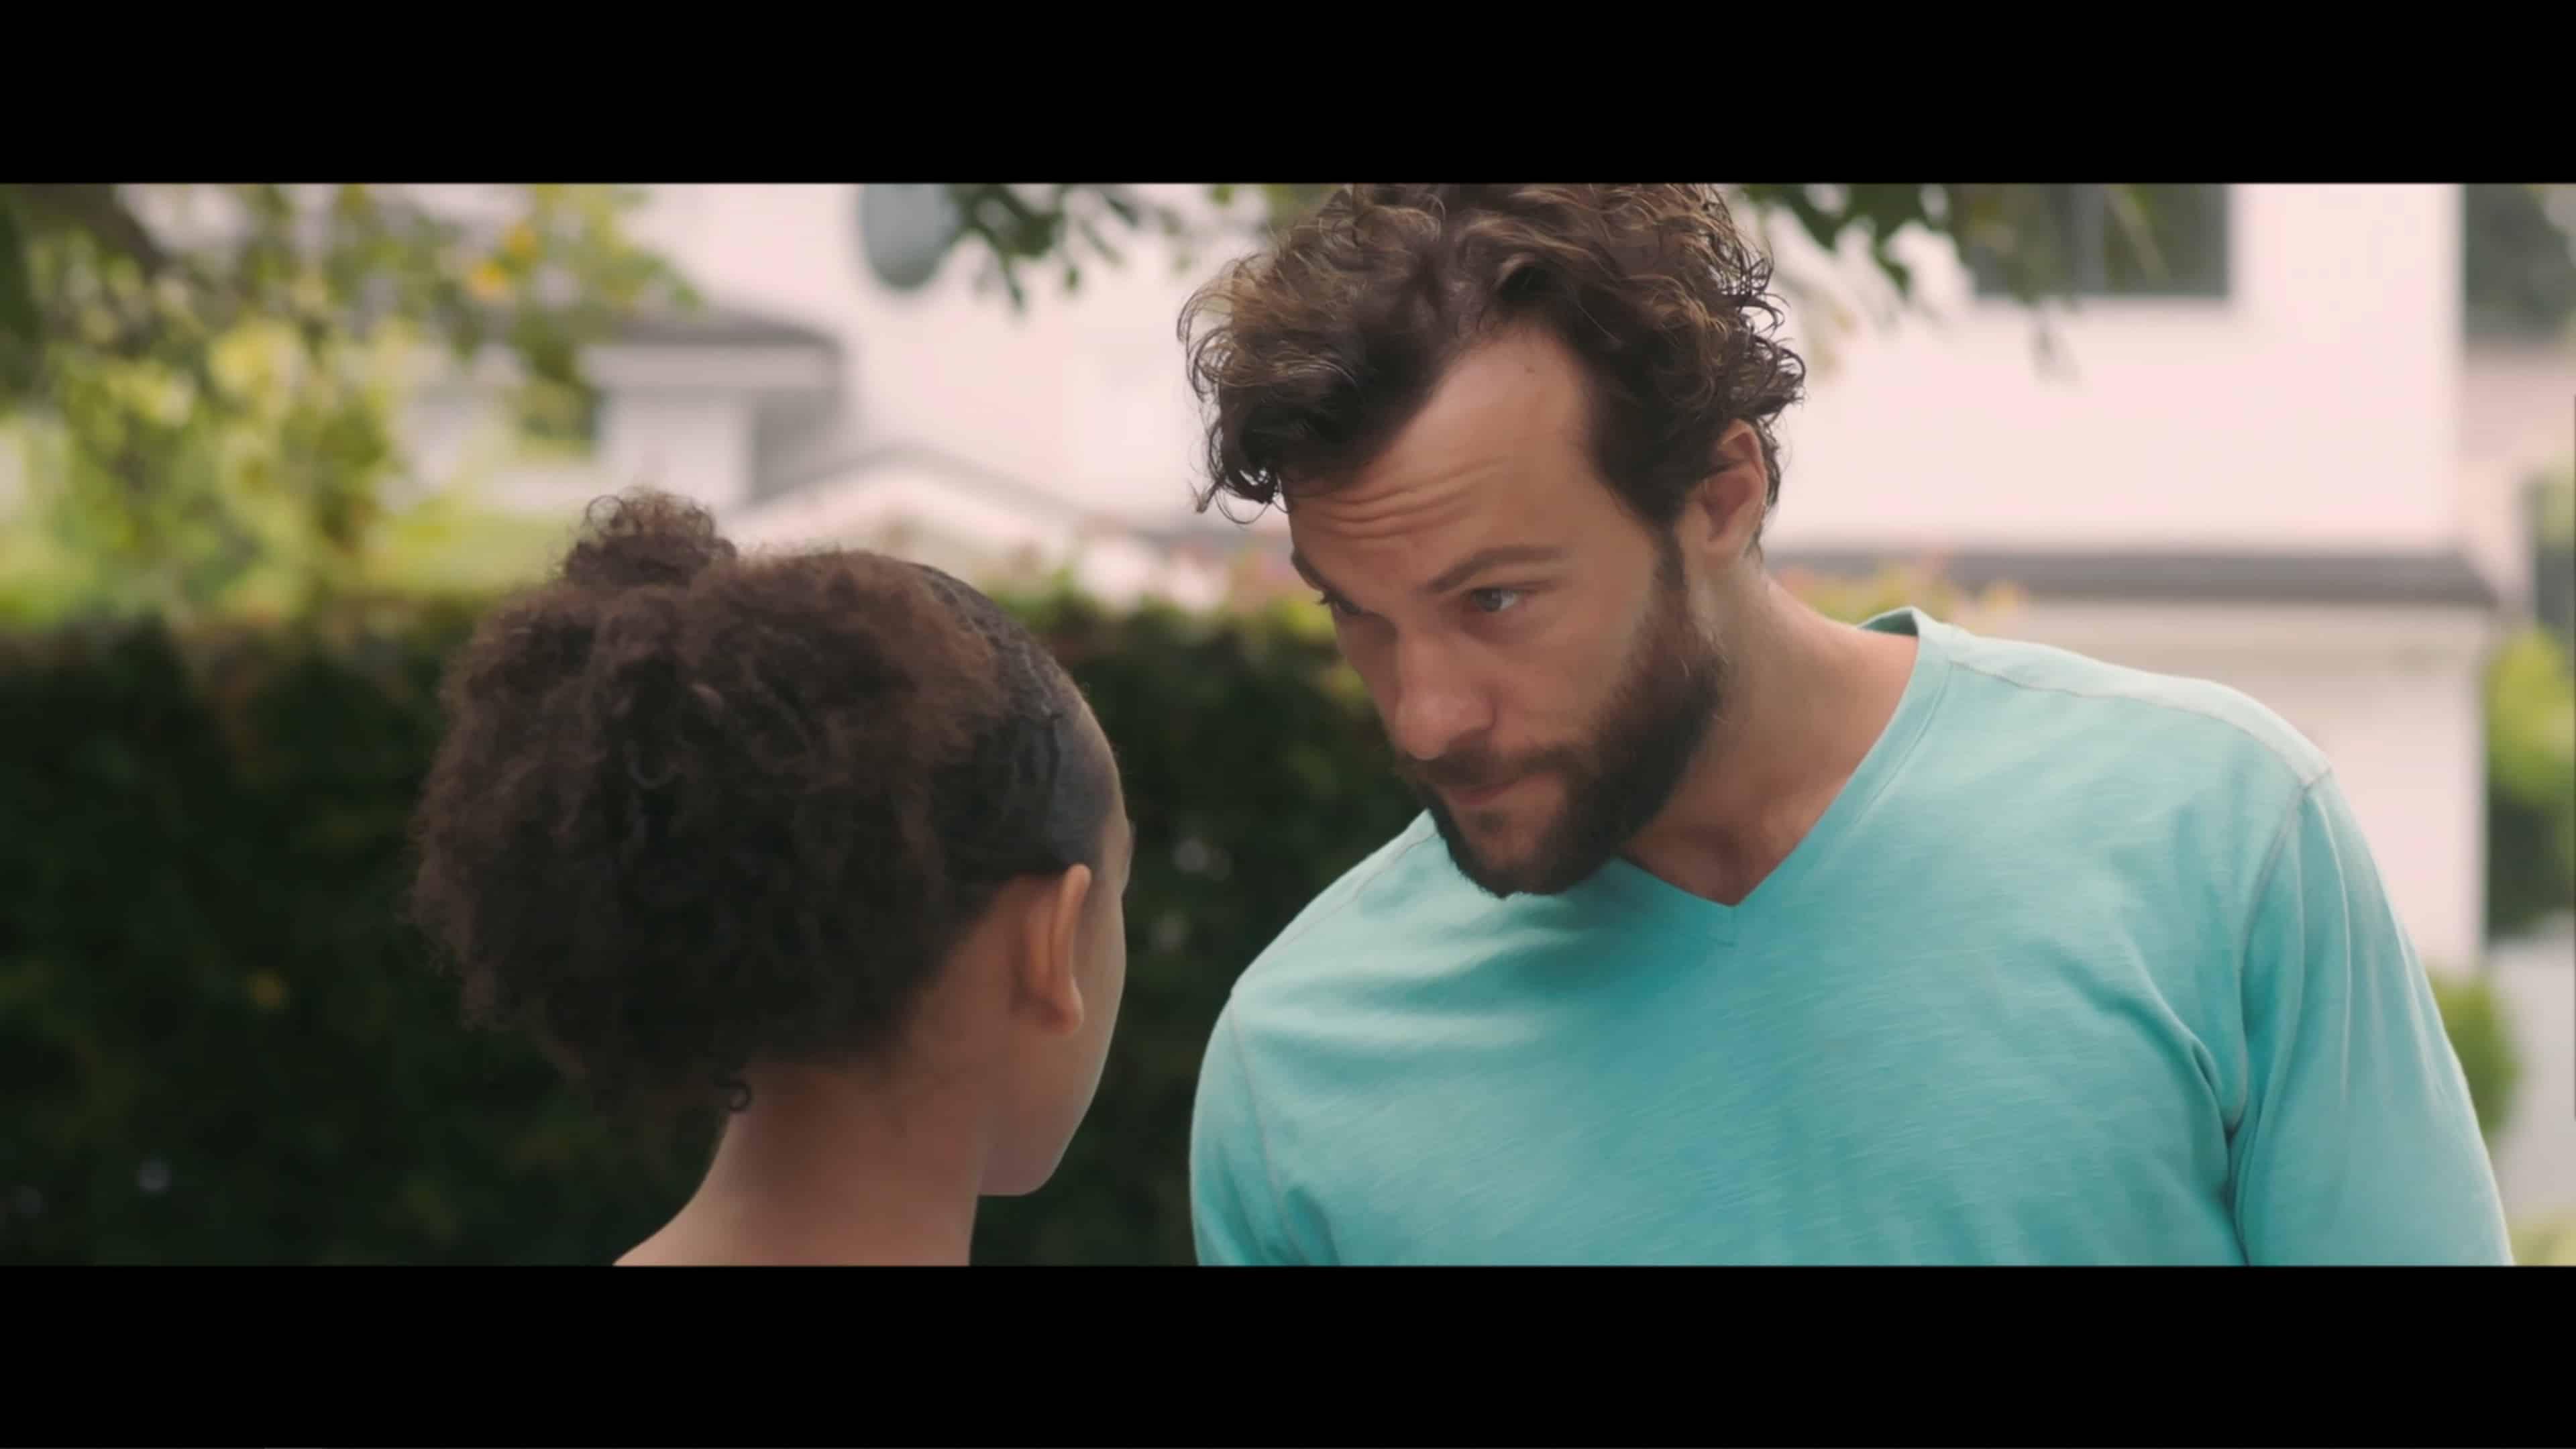 Max (Kyle Schmid) talking to Jillian